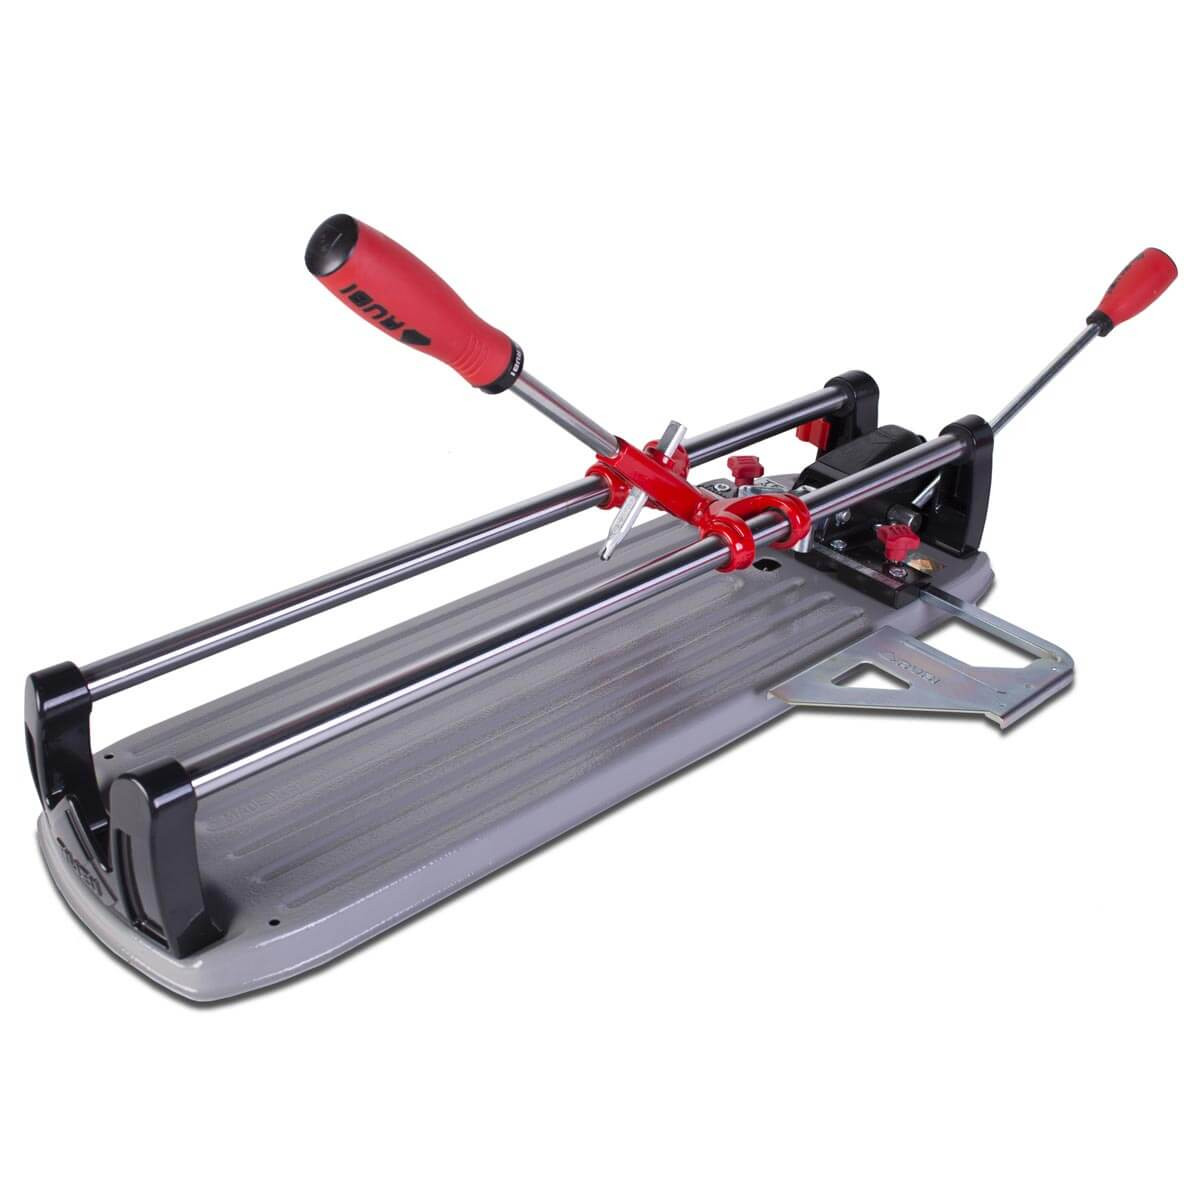 Floor tile cutting tools